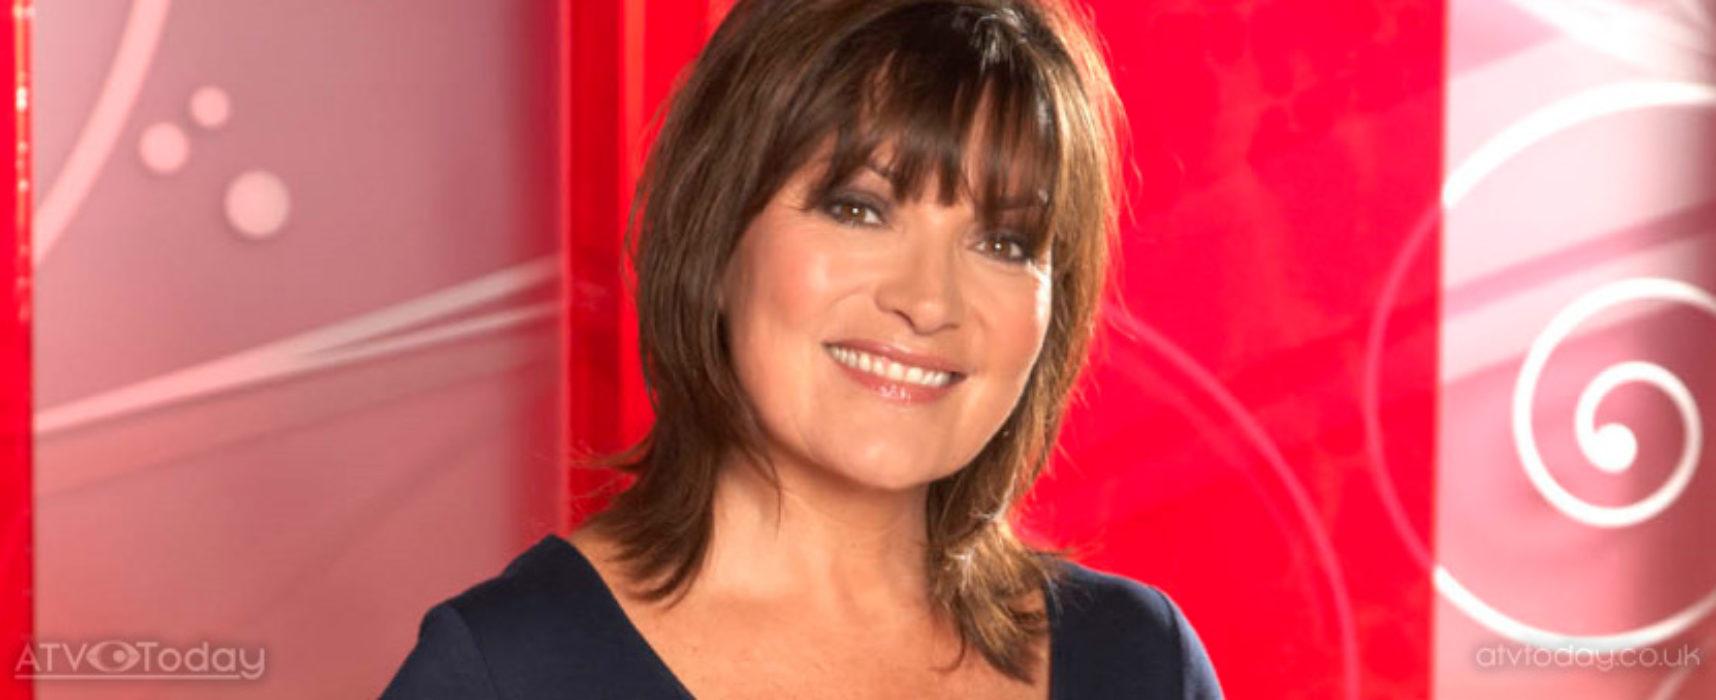 ITV: No Plans To Change Daybreak Name